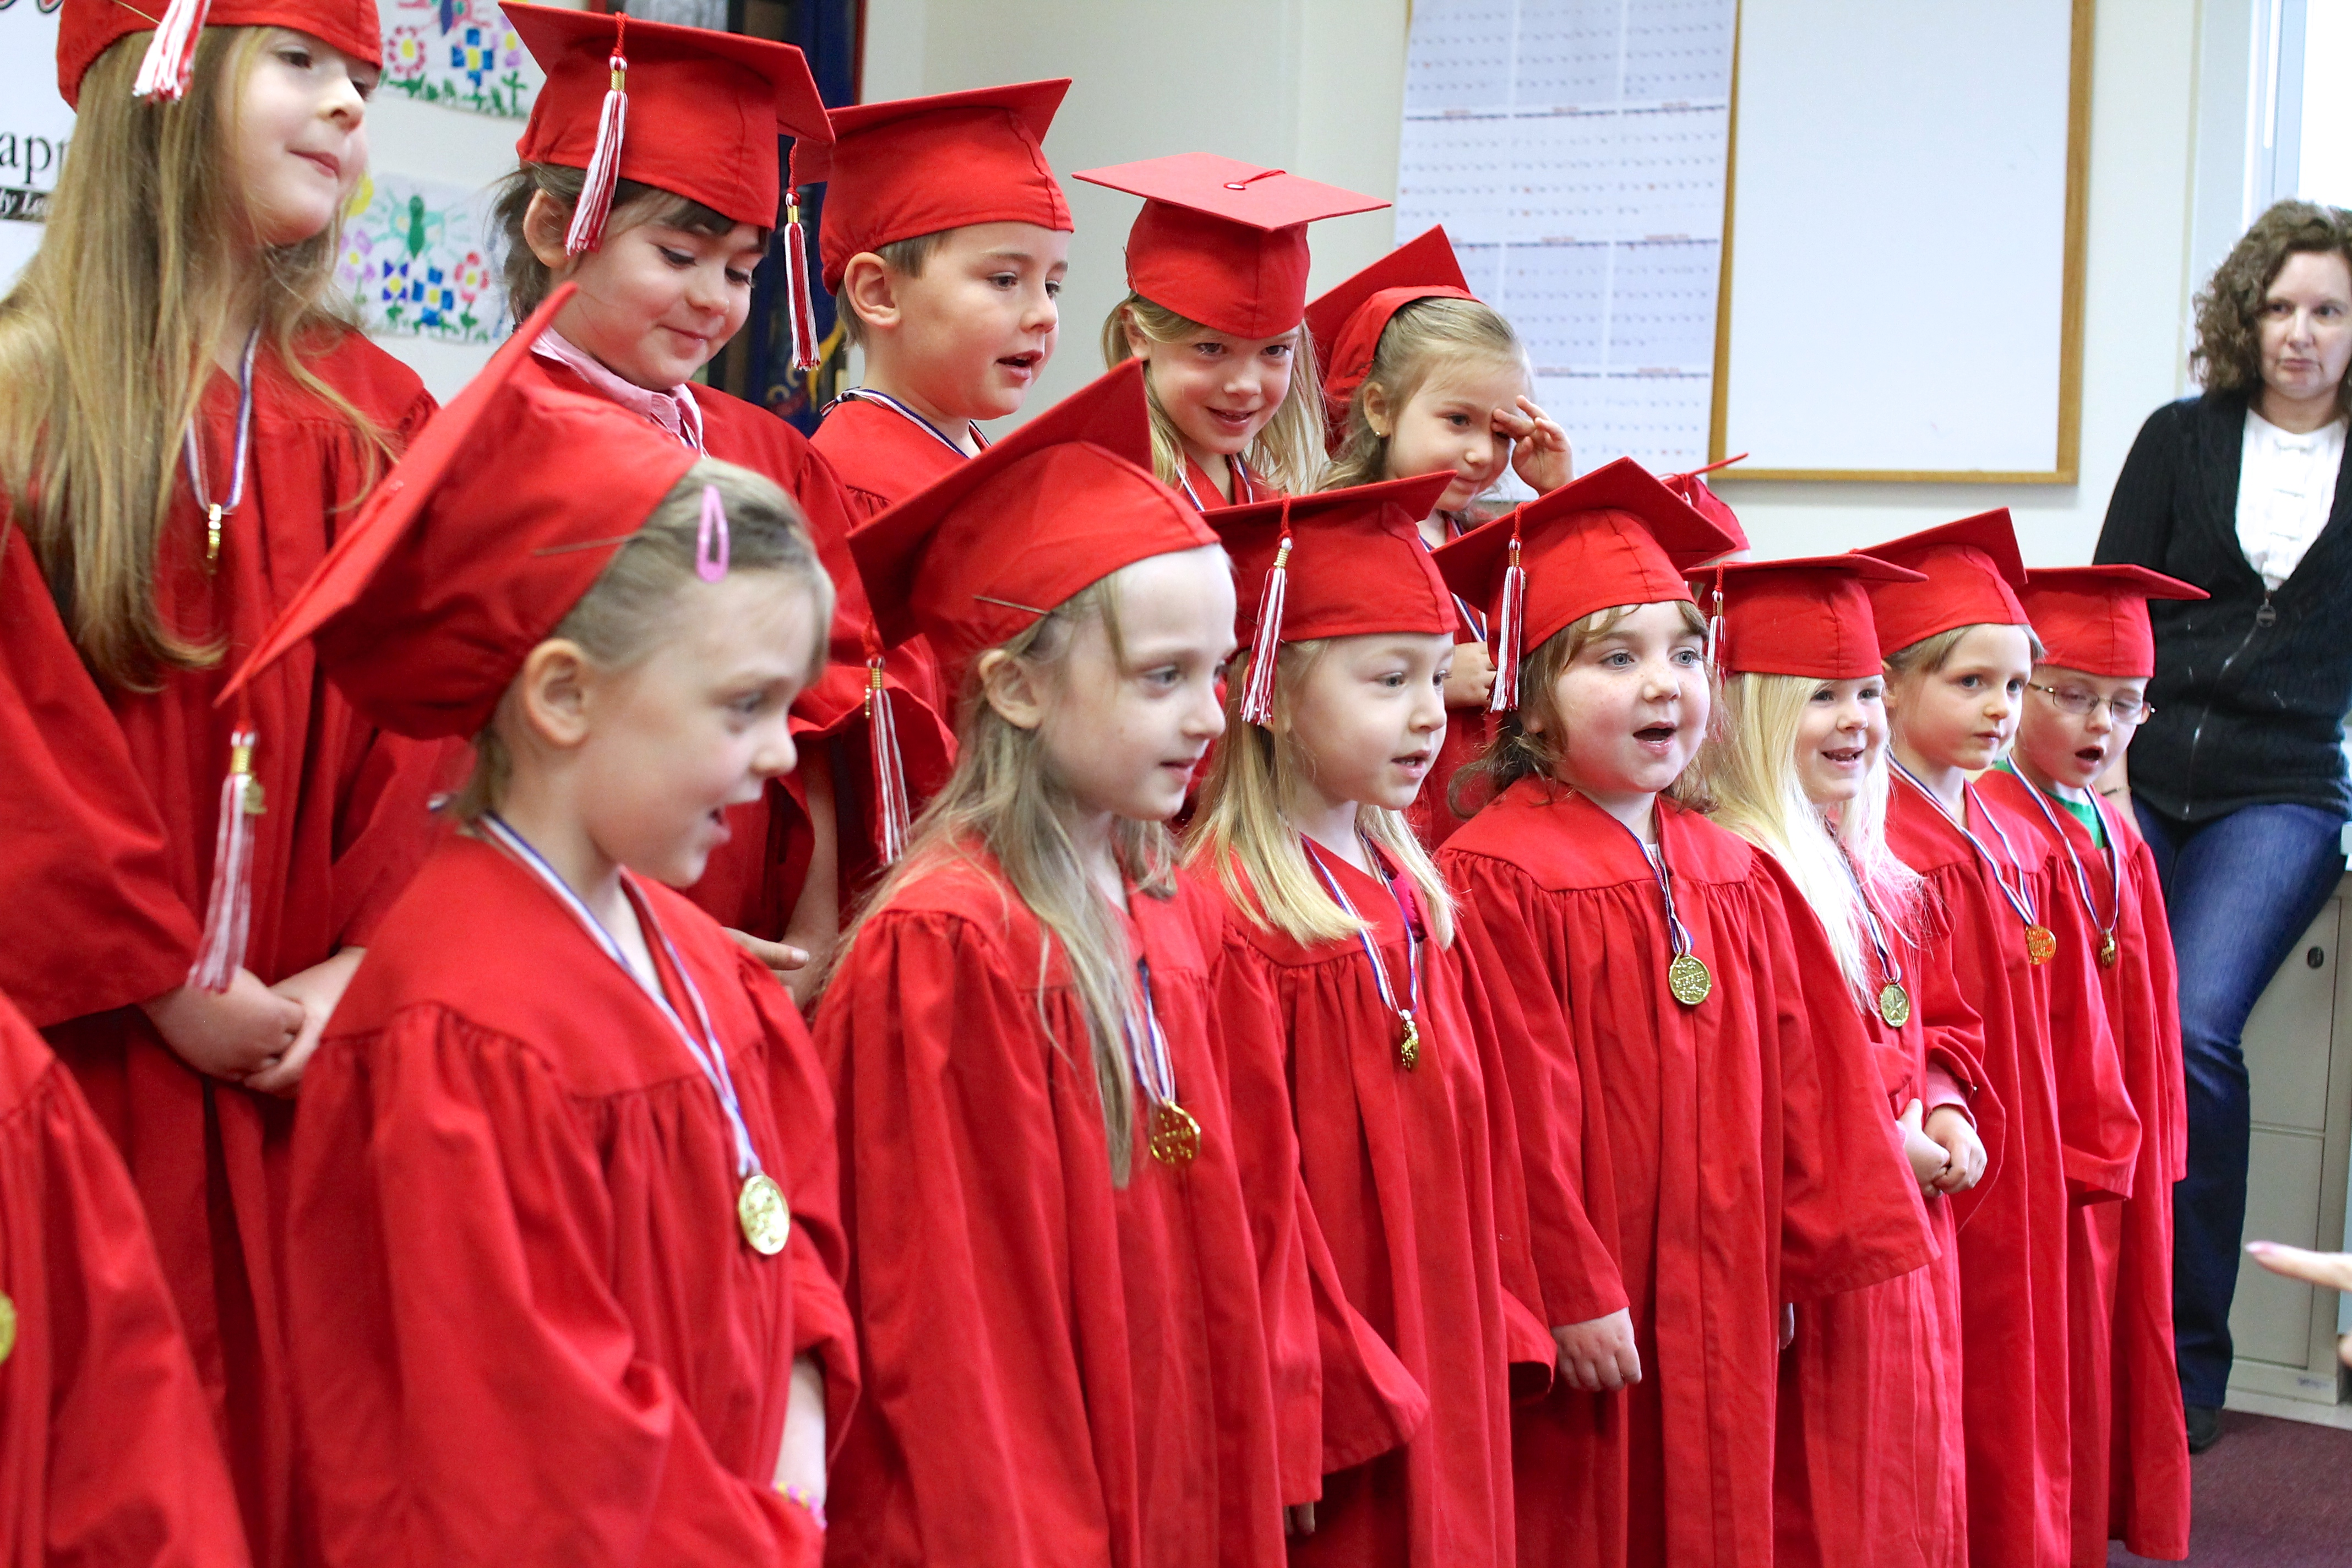 Ainsley Graduates Preschool! - welcometothemousehouse.com